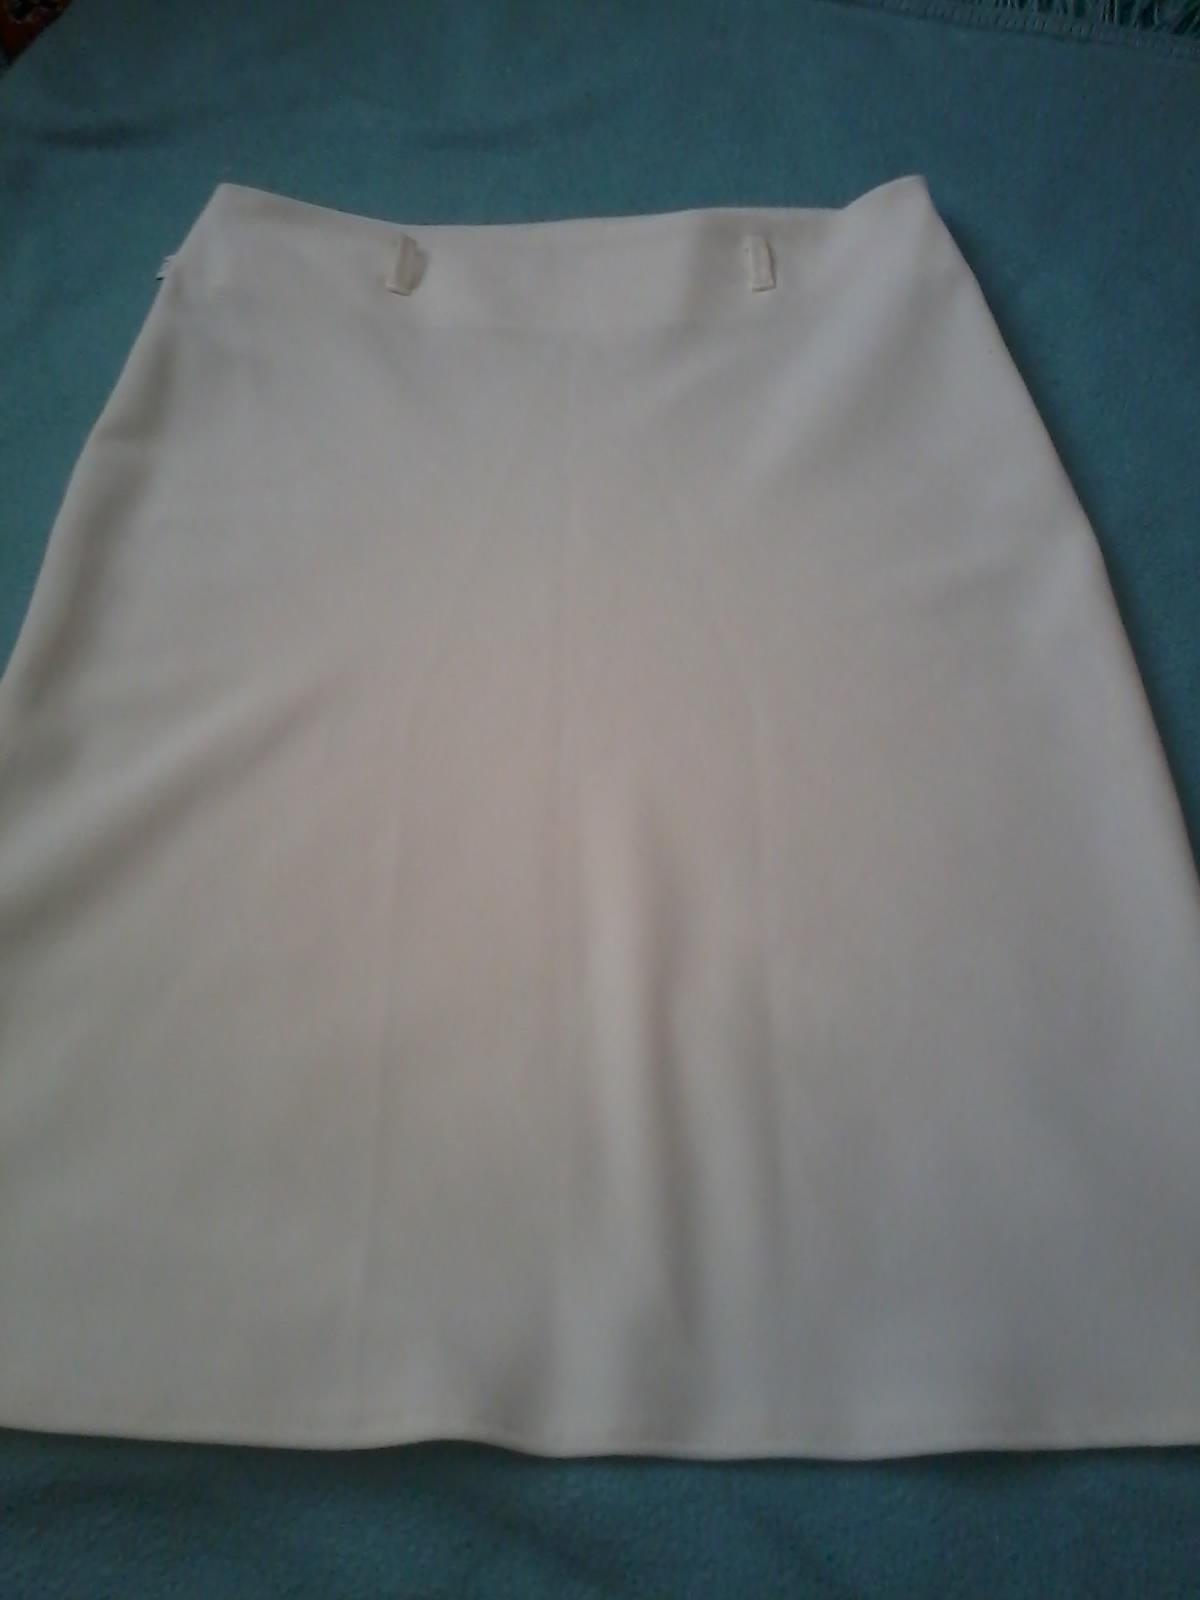 Smotanová suknička - Obrázok č. 1